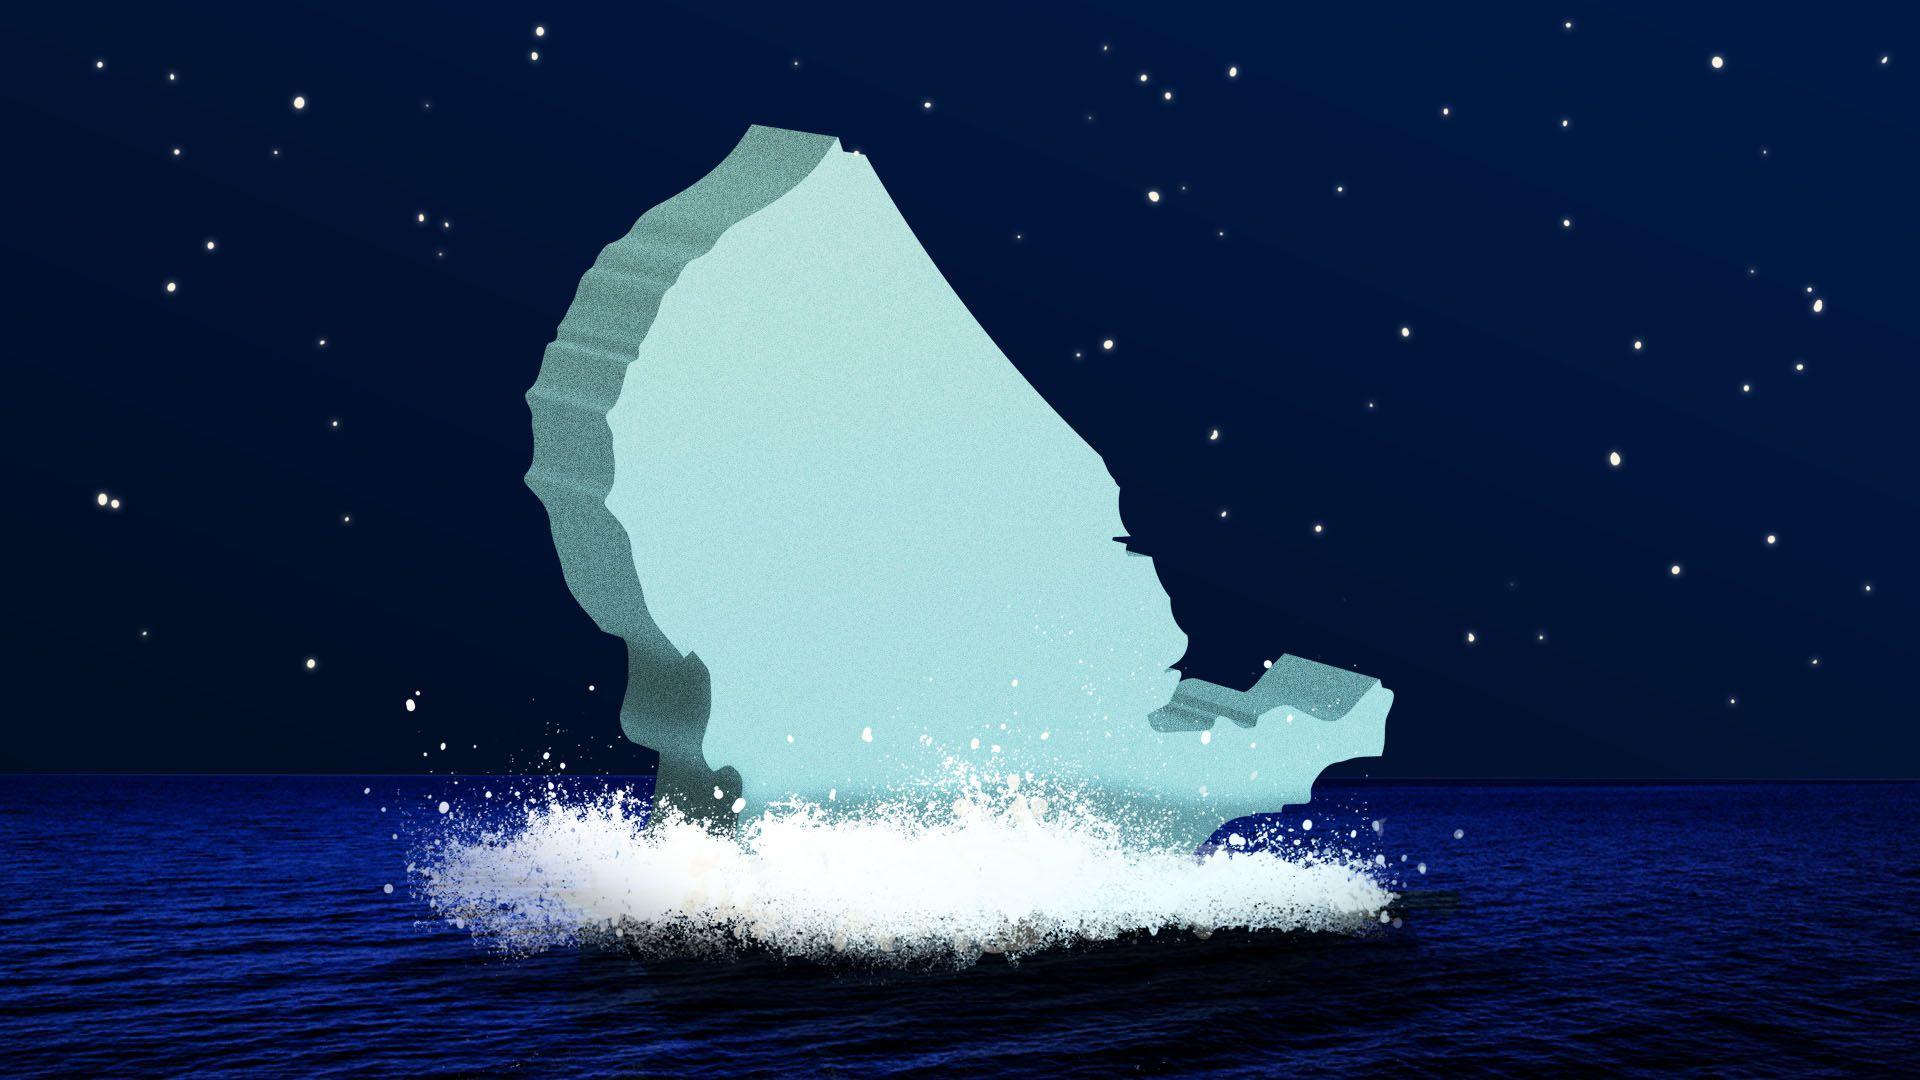 Illustration of U.S. sinking into the ocean like the Titanic